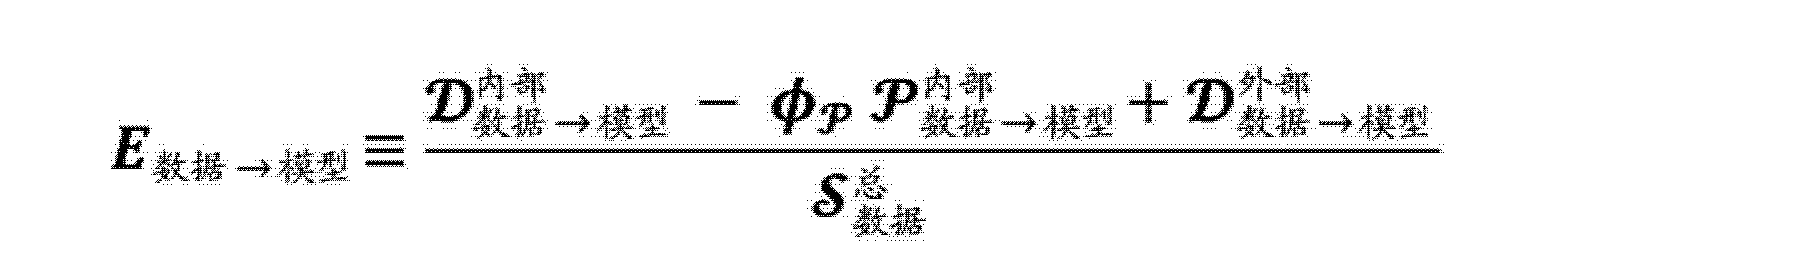 Figure CN104282036AD00304